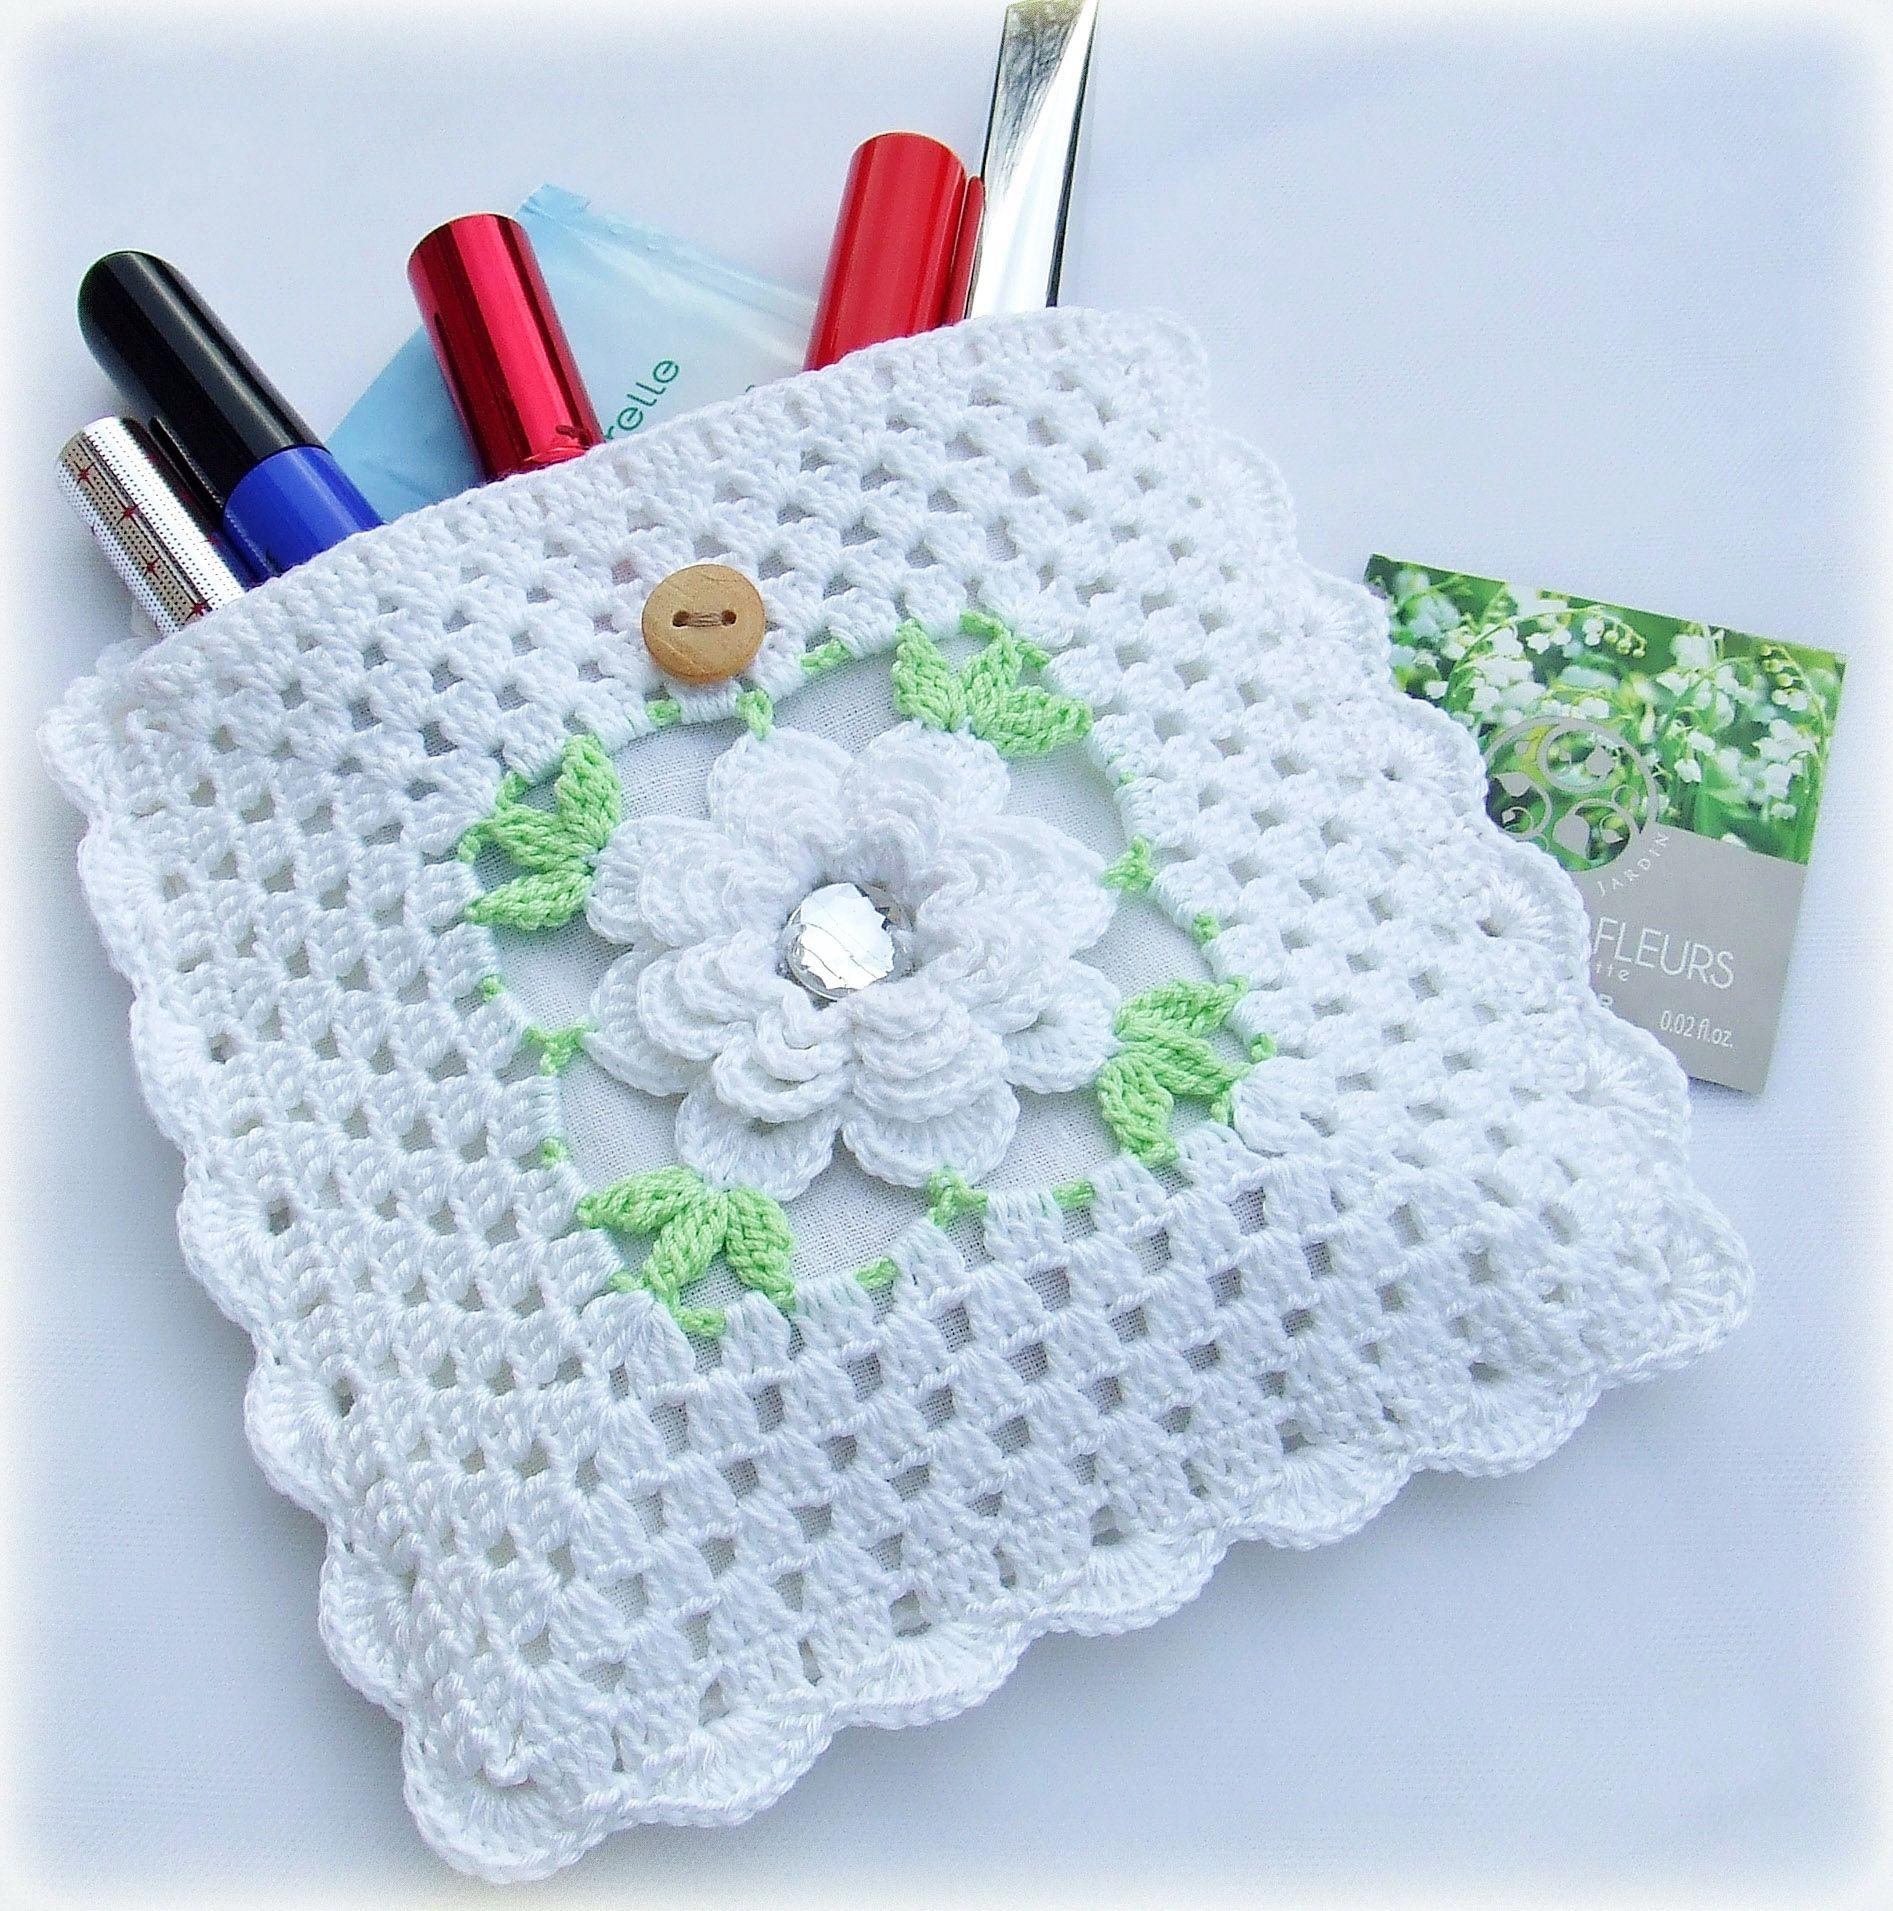 pin bag cotton cosmetics white knitting